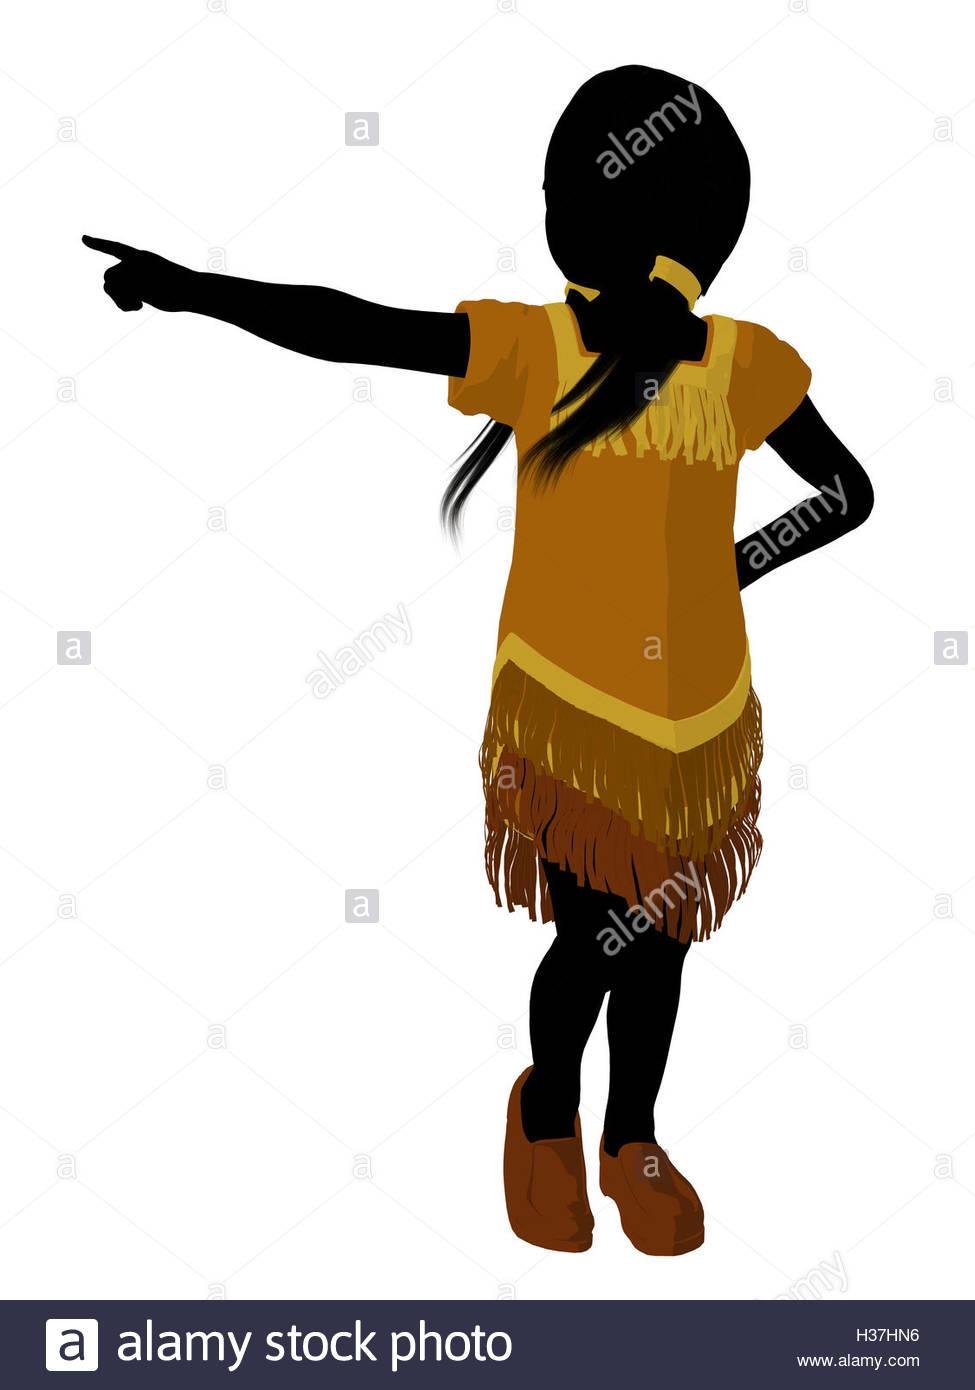 975x1390 Native American Indian Art Illustration Silhouette Stock Photo